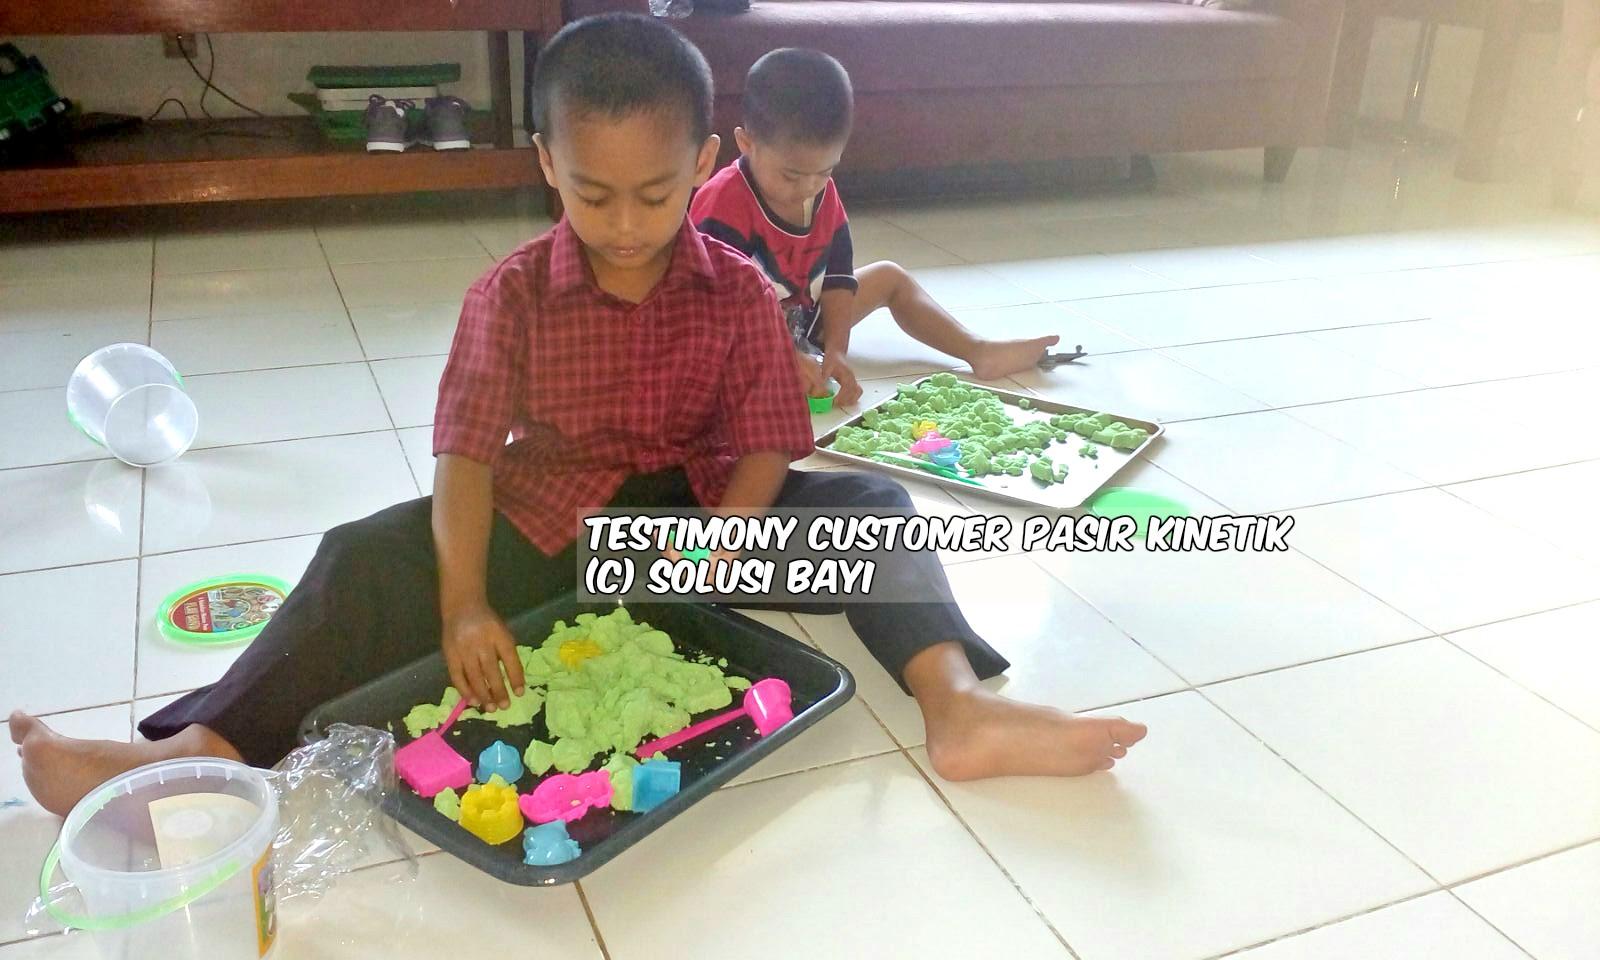 testimony customer www.pasirkinetik.com solusi bayi mainan edukatif anak pasir kinetik super jumbo kinetic sand playsand model sand motion sand isand 7